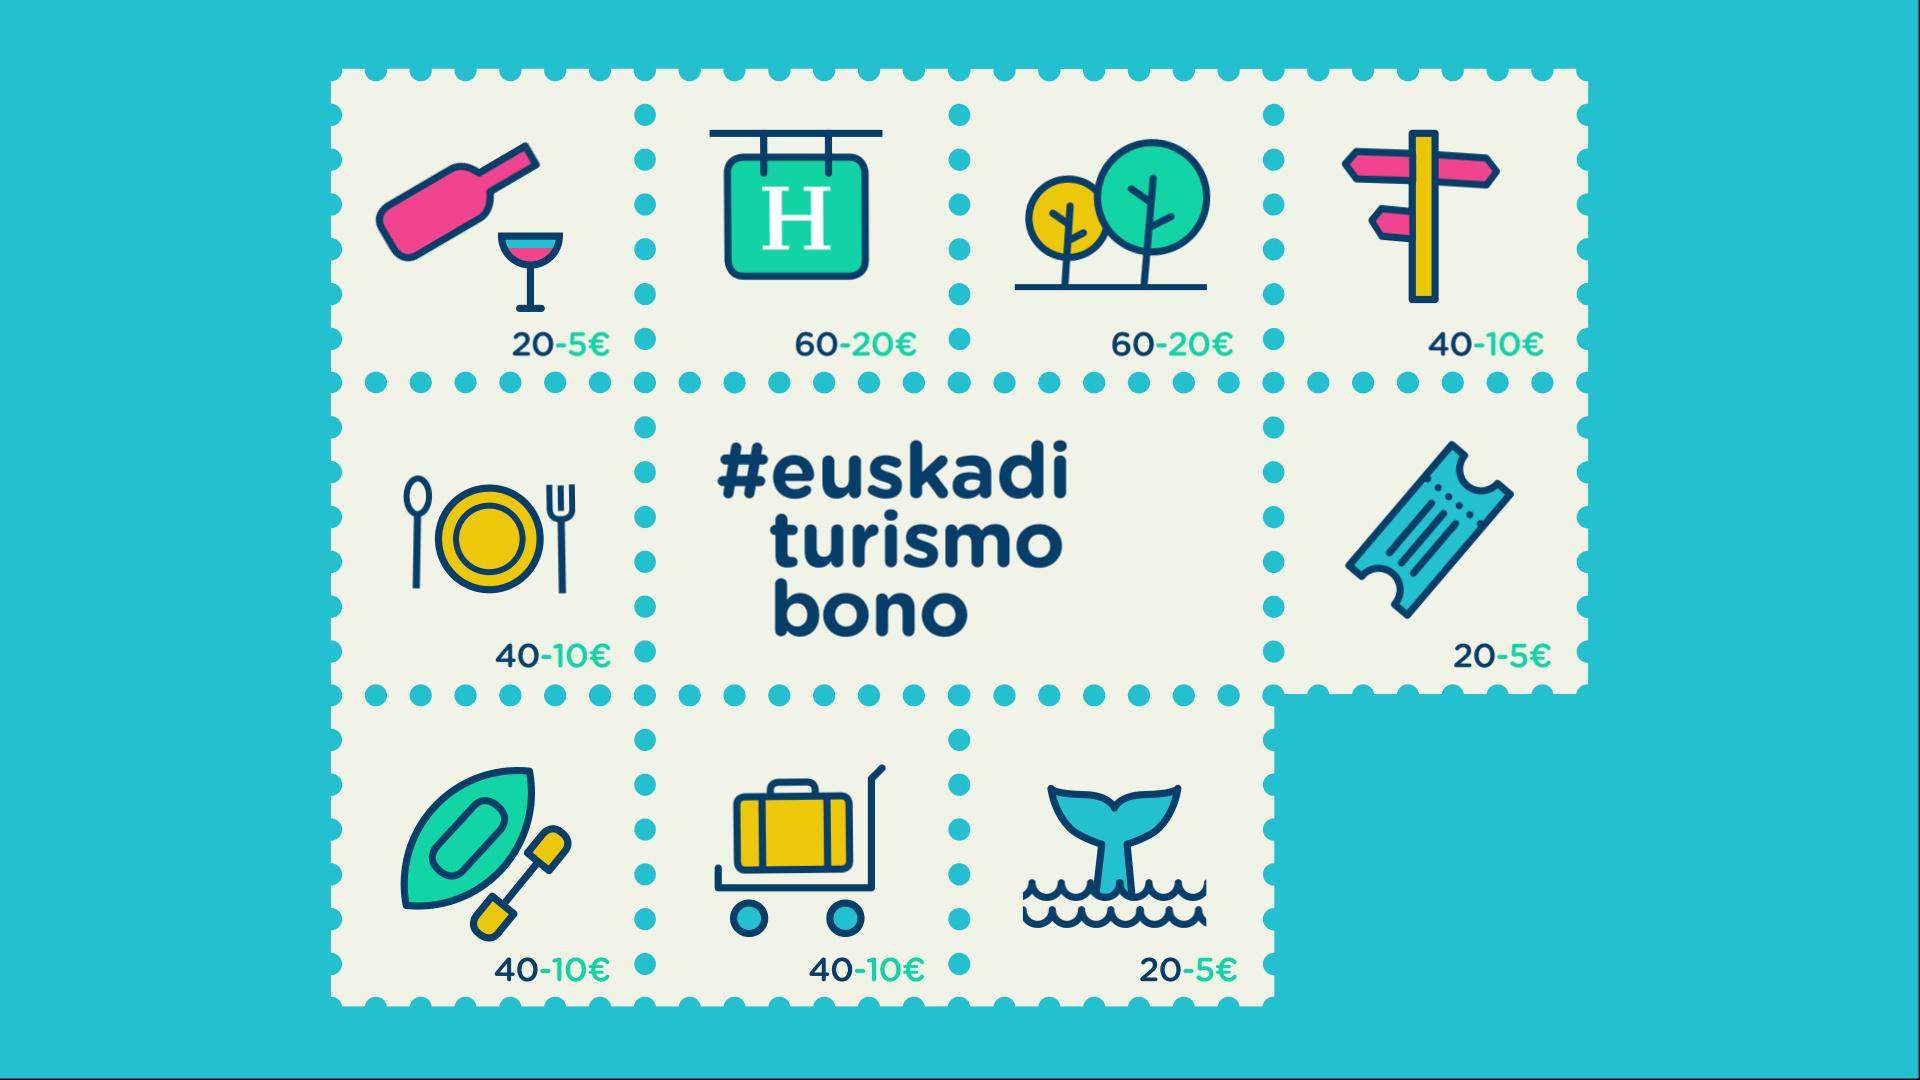 Euskadi turismo bono [0:20]